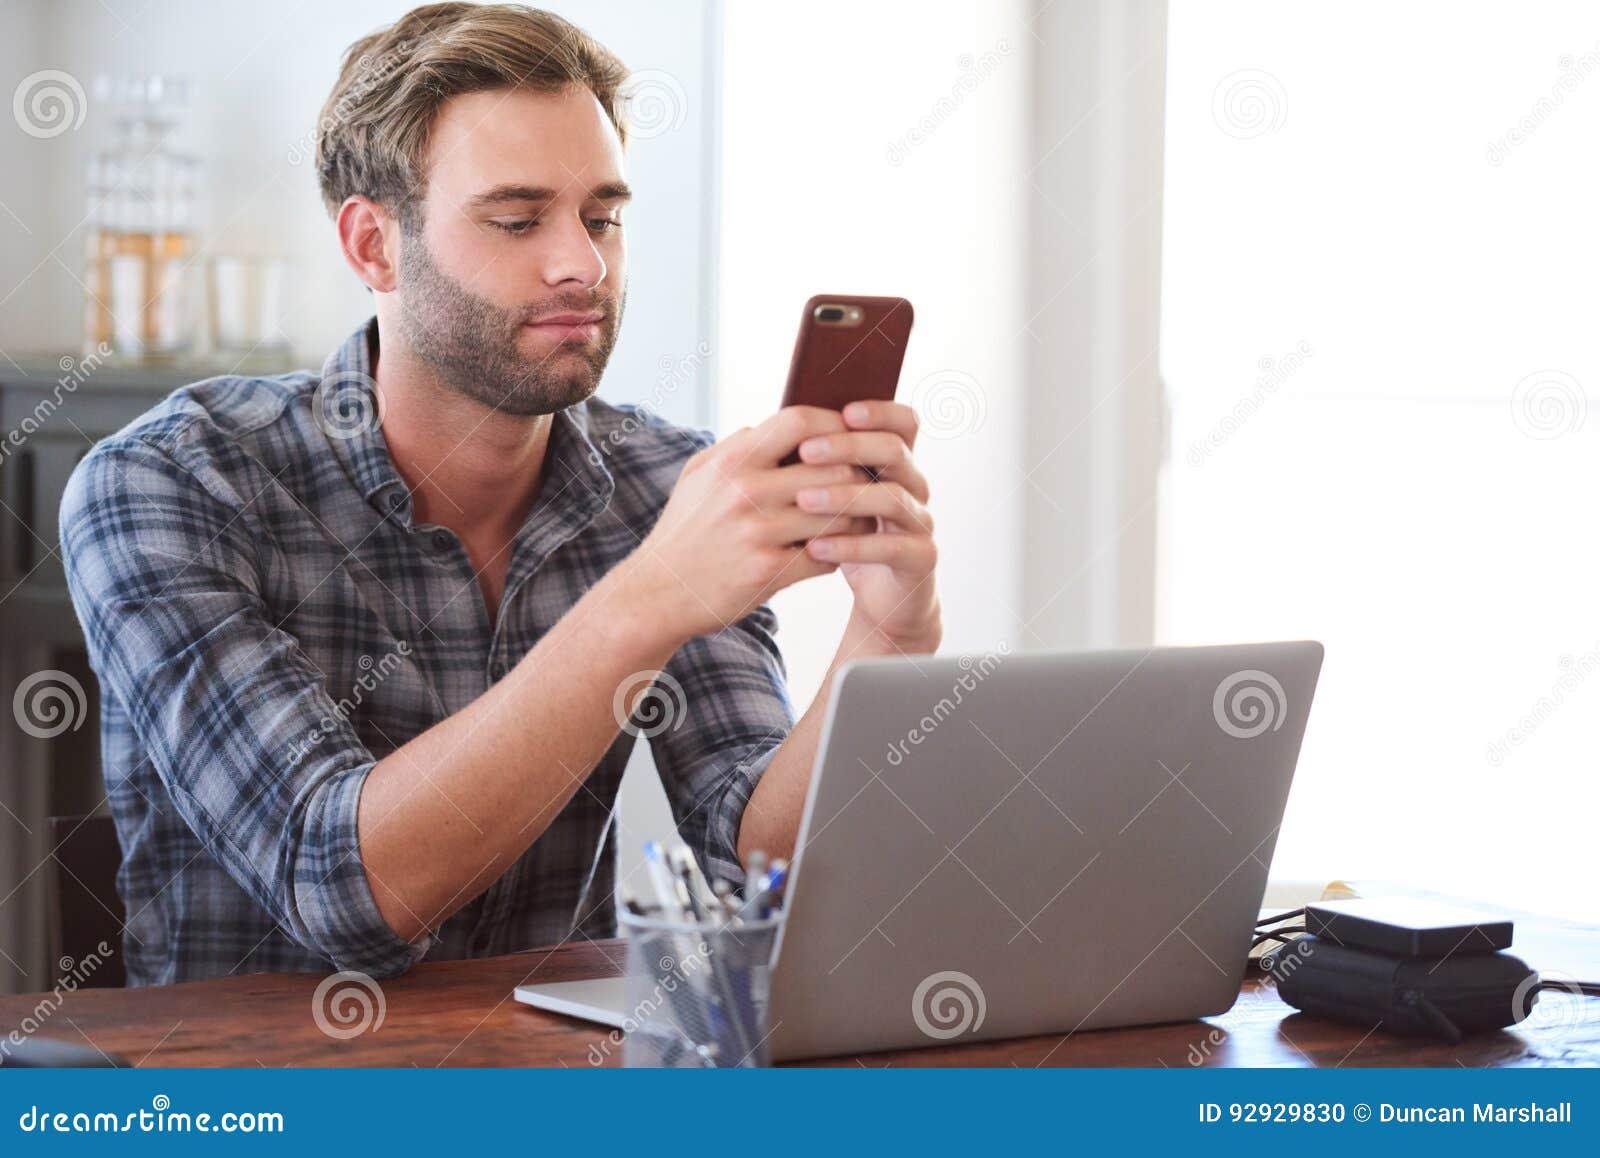 flirting text messages for men